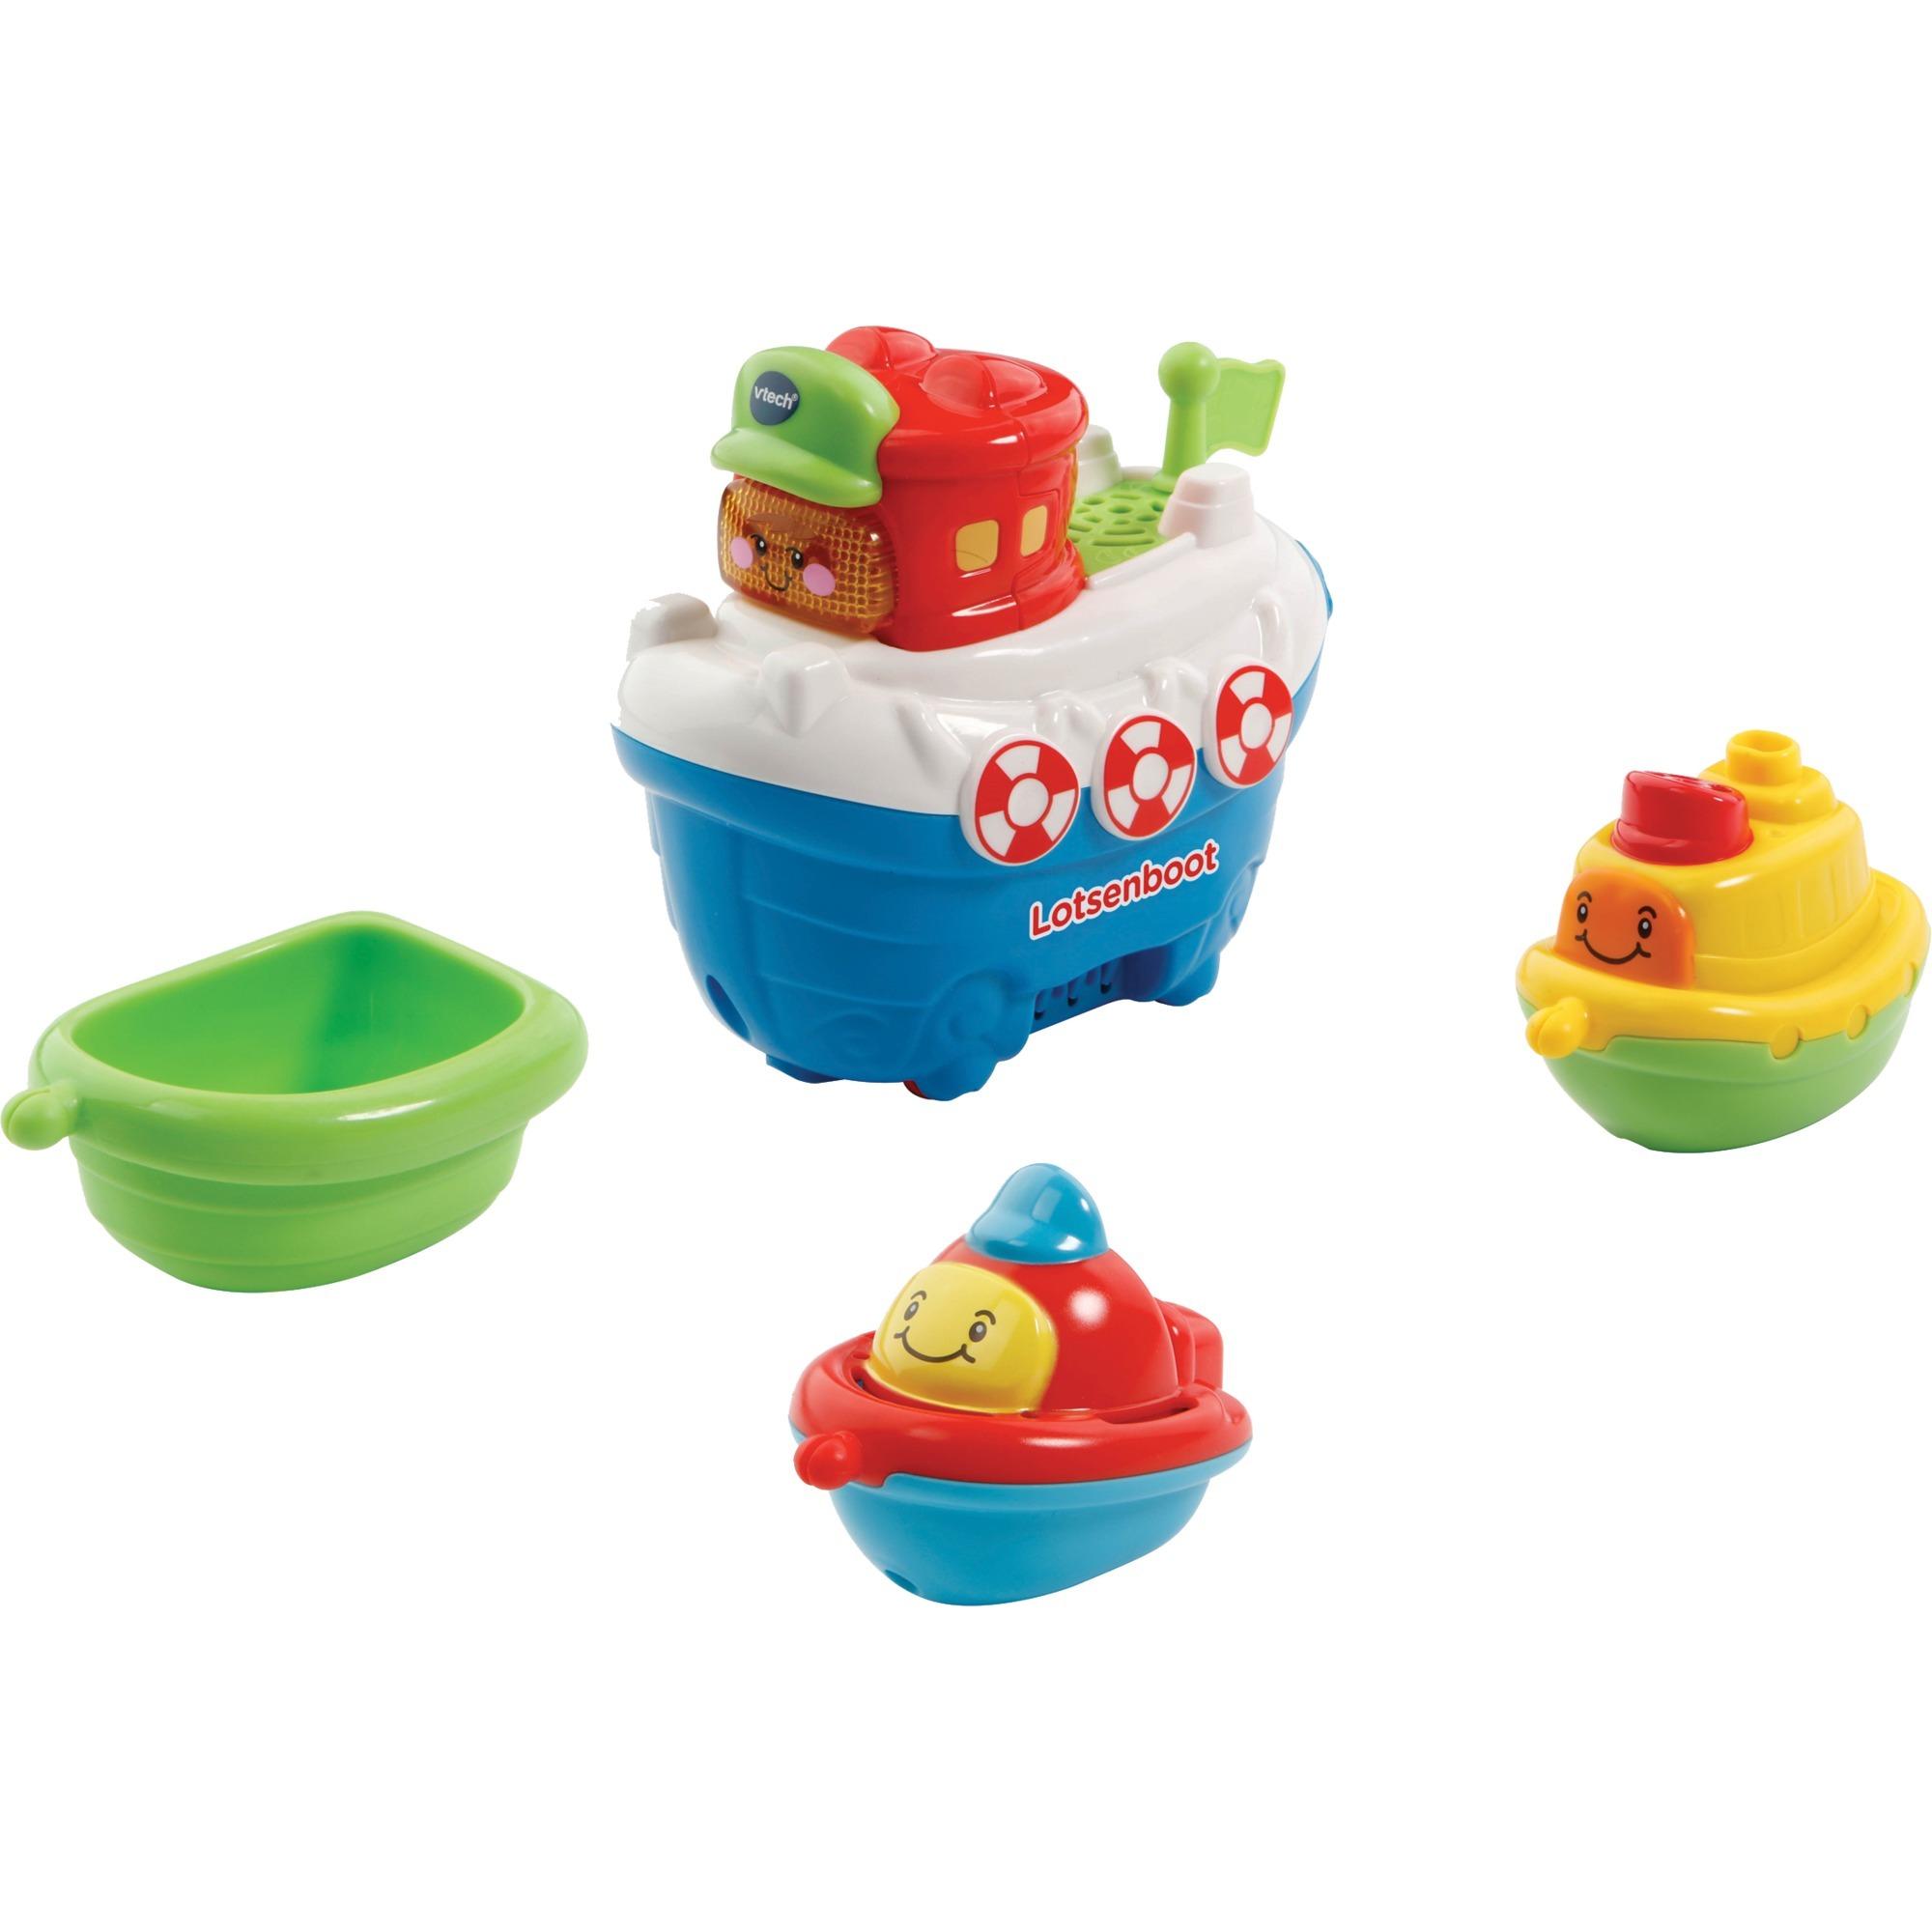 80-500304-badebaad-flerfarvet-legetoj-til-badet-model-koretoj